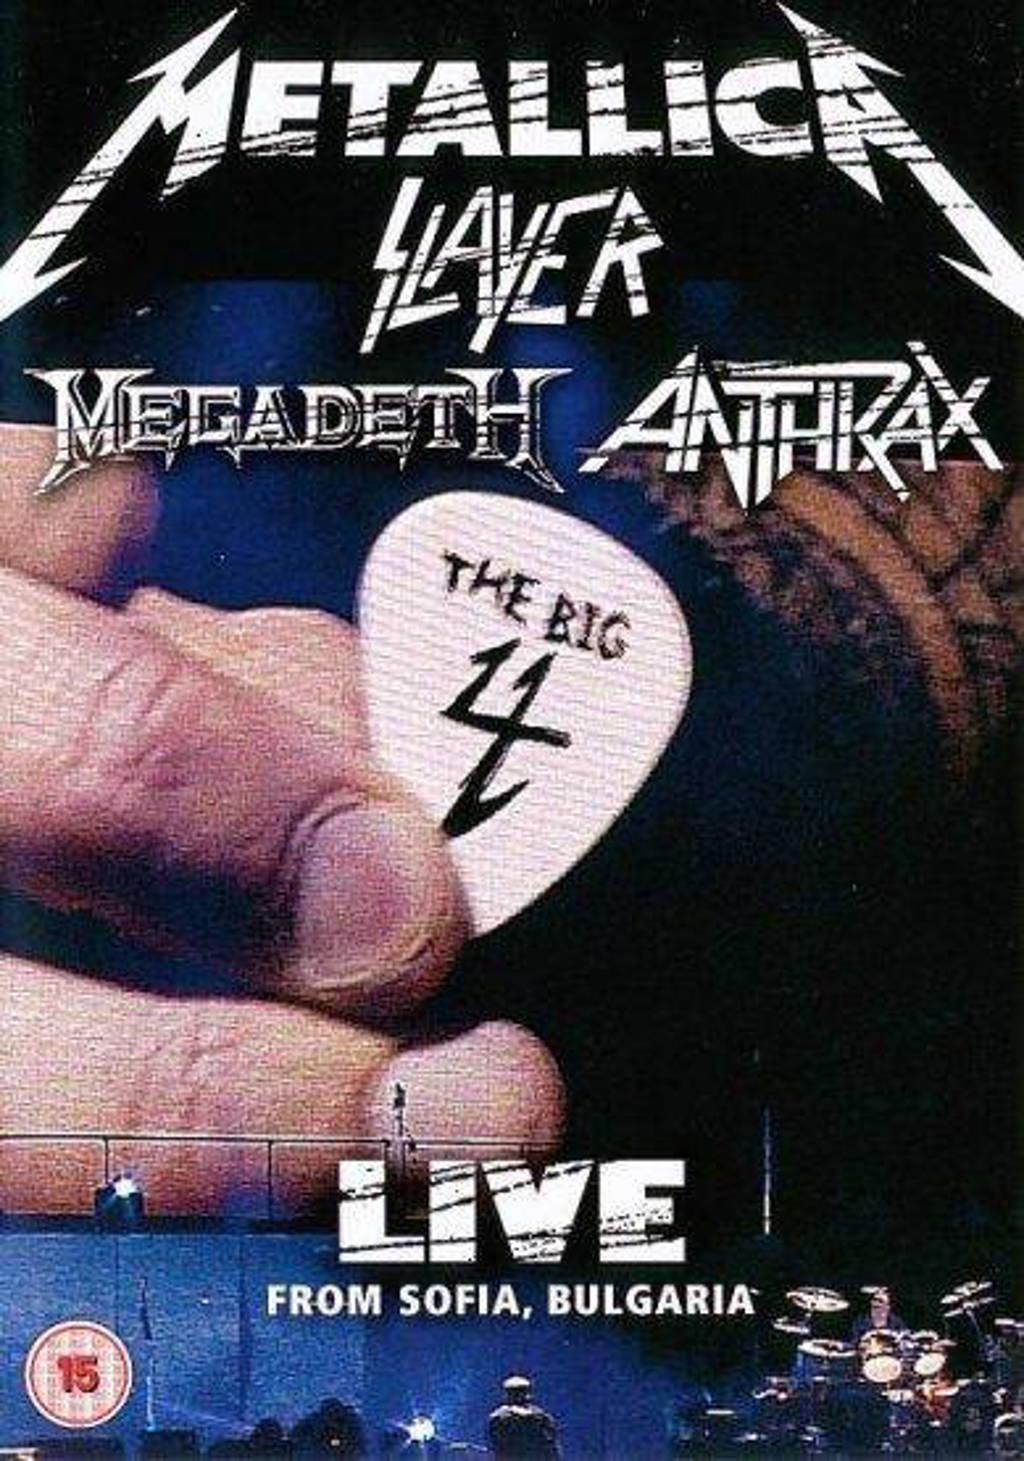 Metallica/Slayer/Megadeth/Anthrax - The Big Four: Live From Sofia Bulga (DVD)